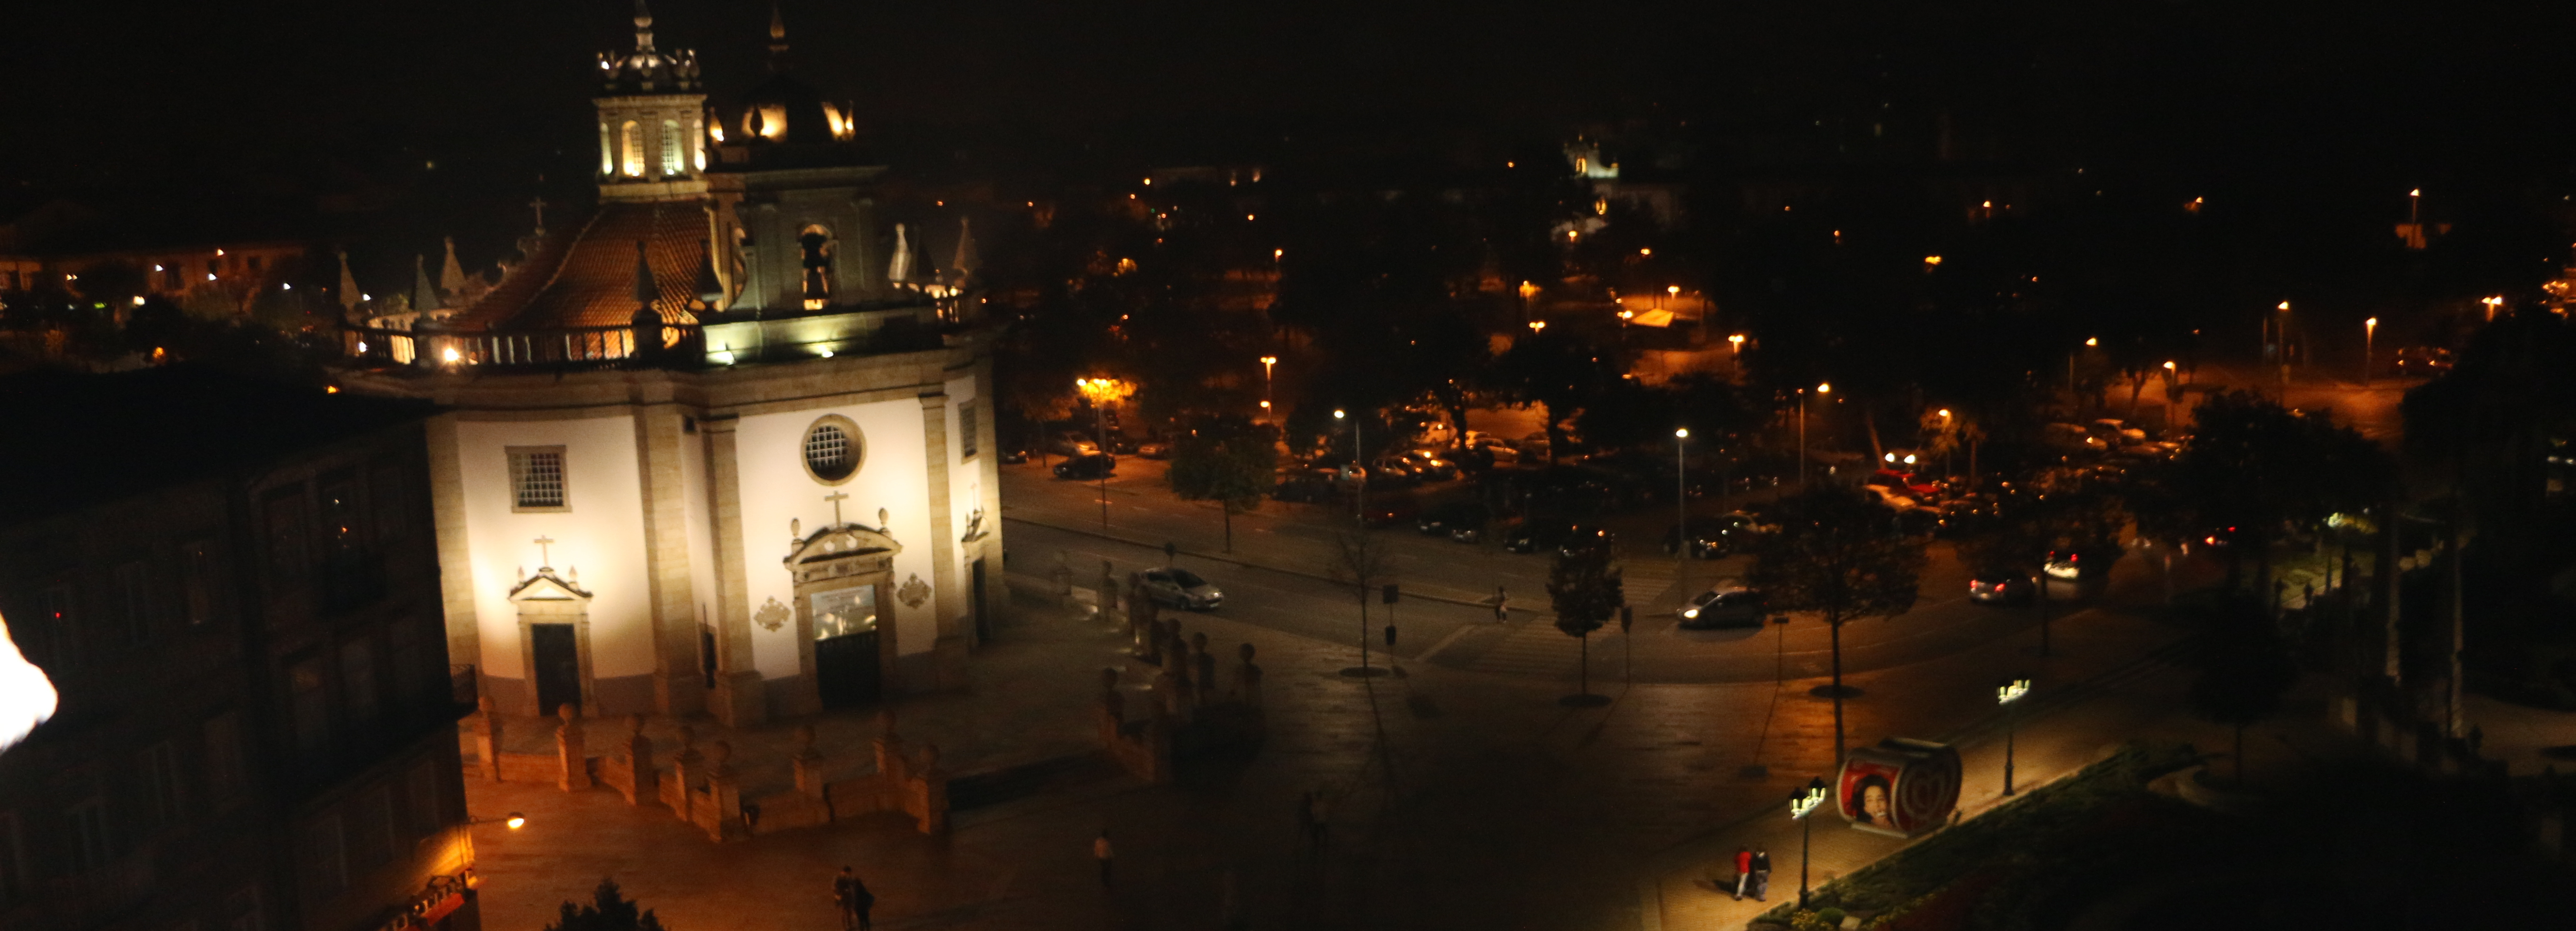 Centro Histórico de Barcelos volta a ser palco de visita teatralizada